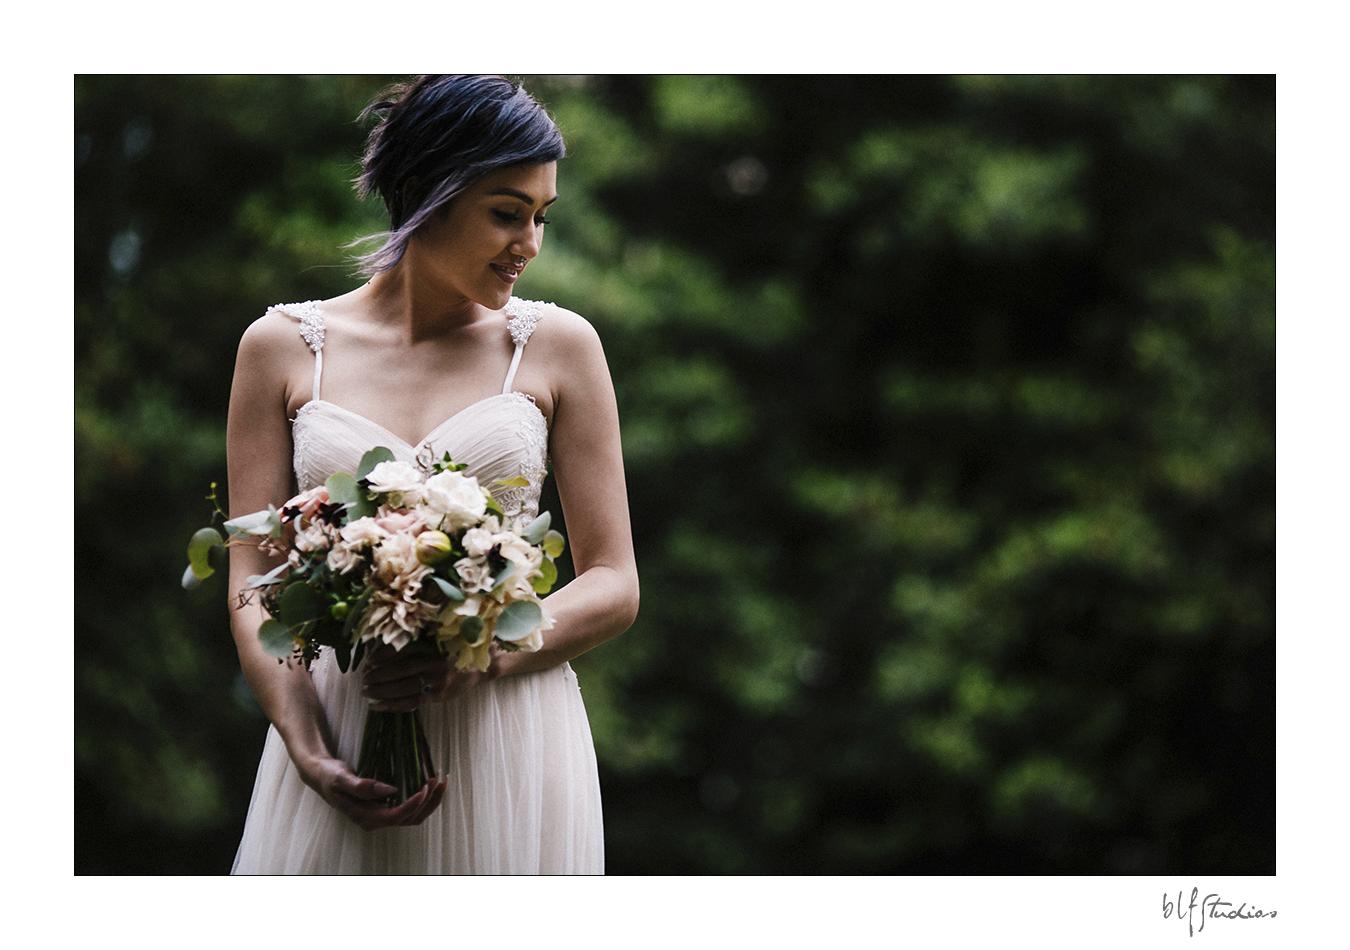 0027-blfstudios-wedding-photographer-daniel-danielle-atlanta.jpg